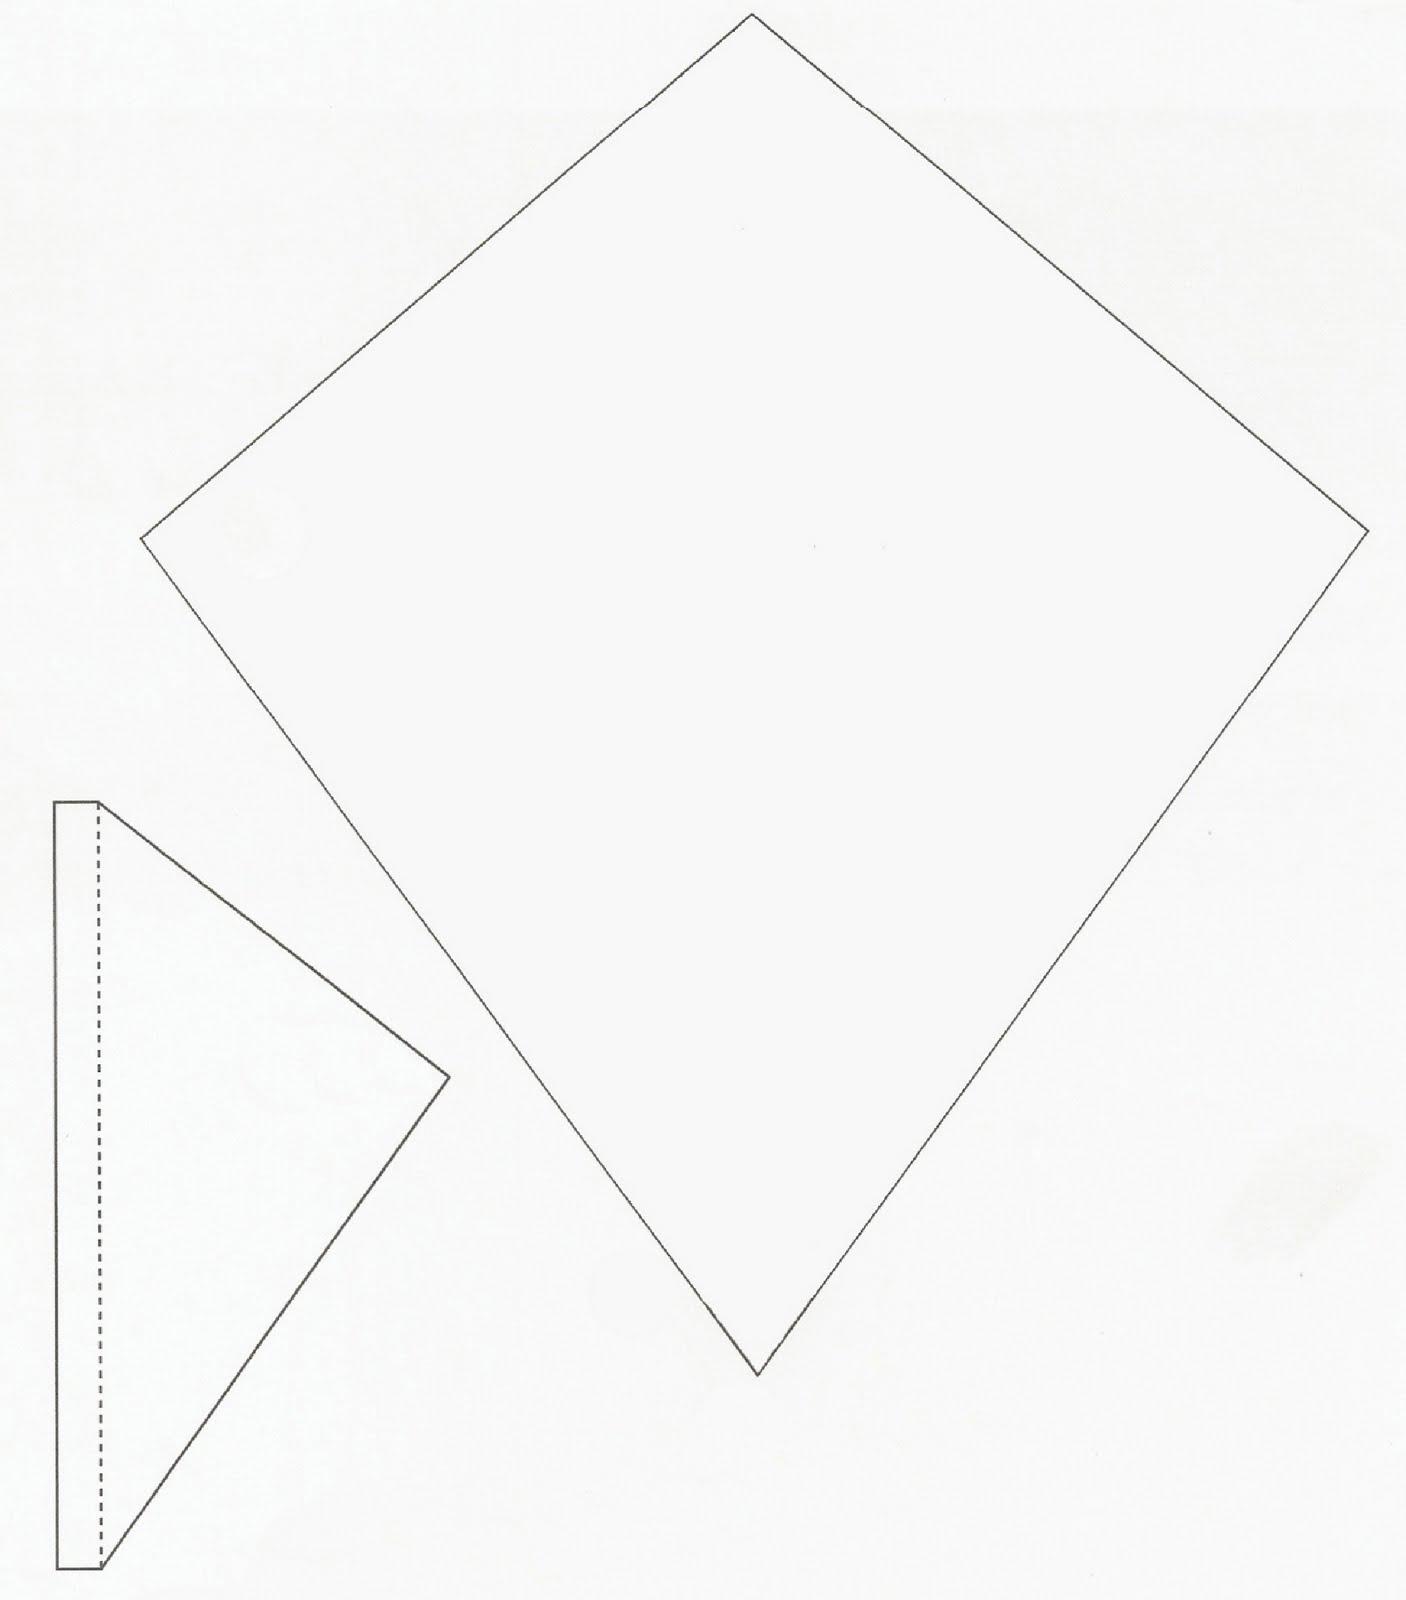 printable kite pattern search results calendar 2015. Black Bedroom Furniture Sets. Home Design Ideas